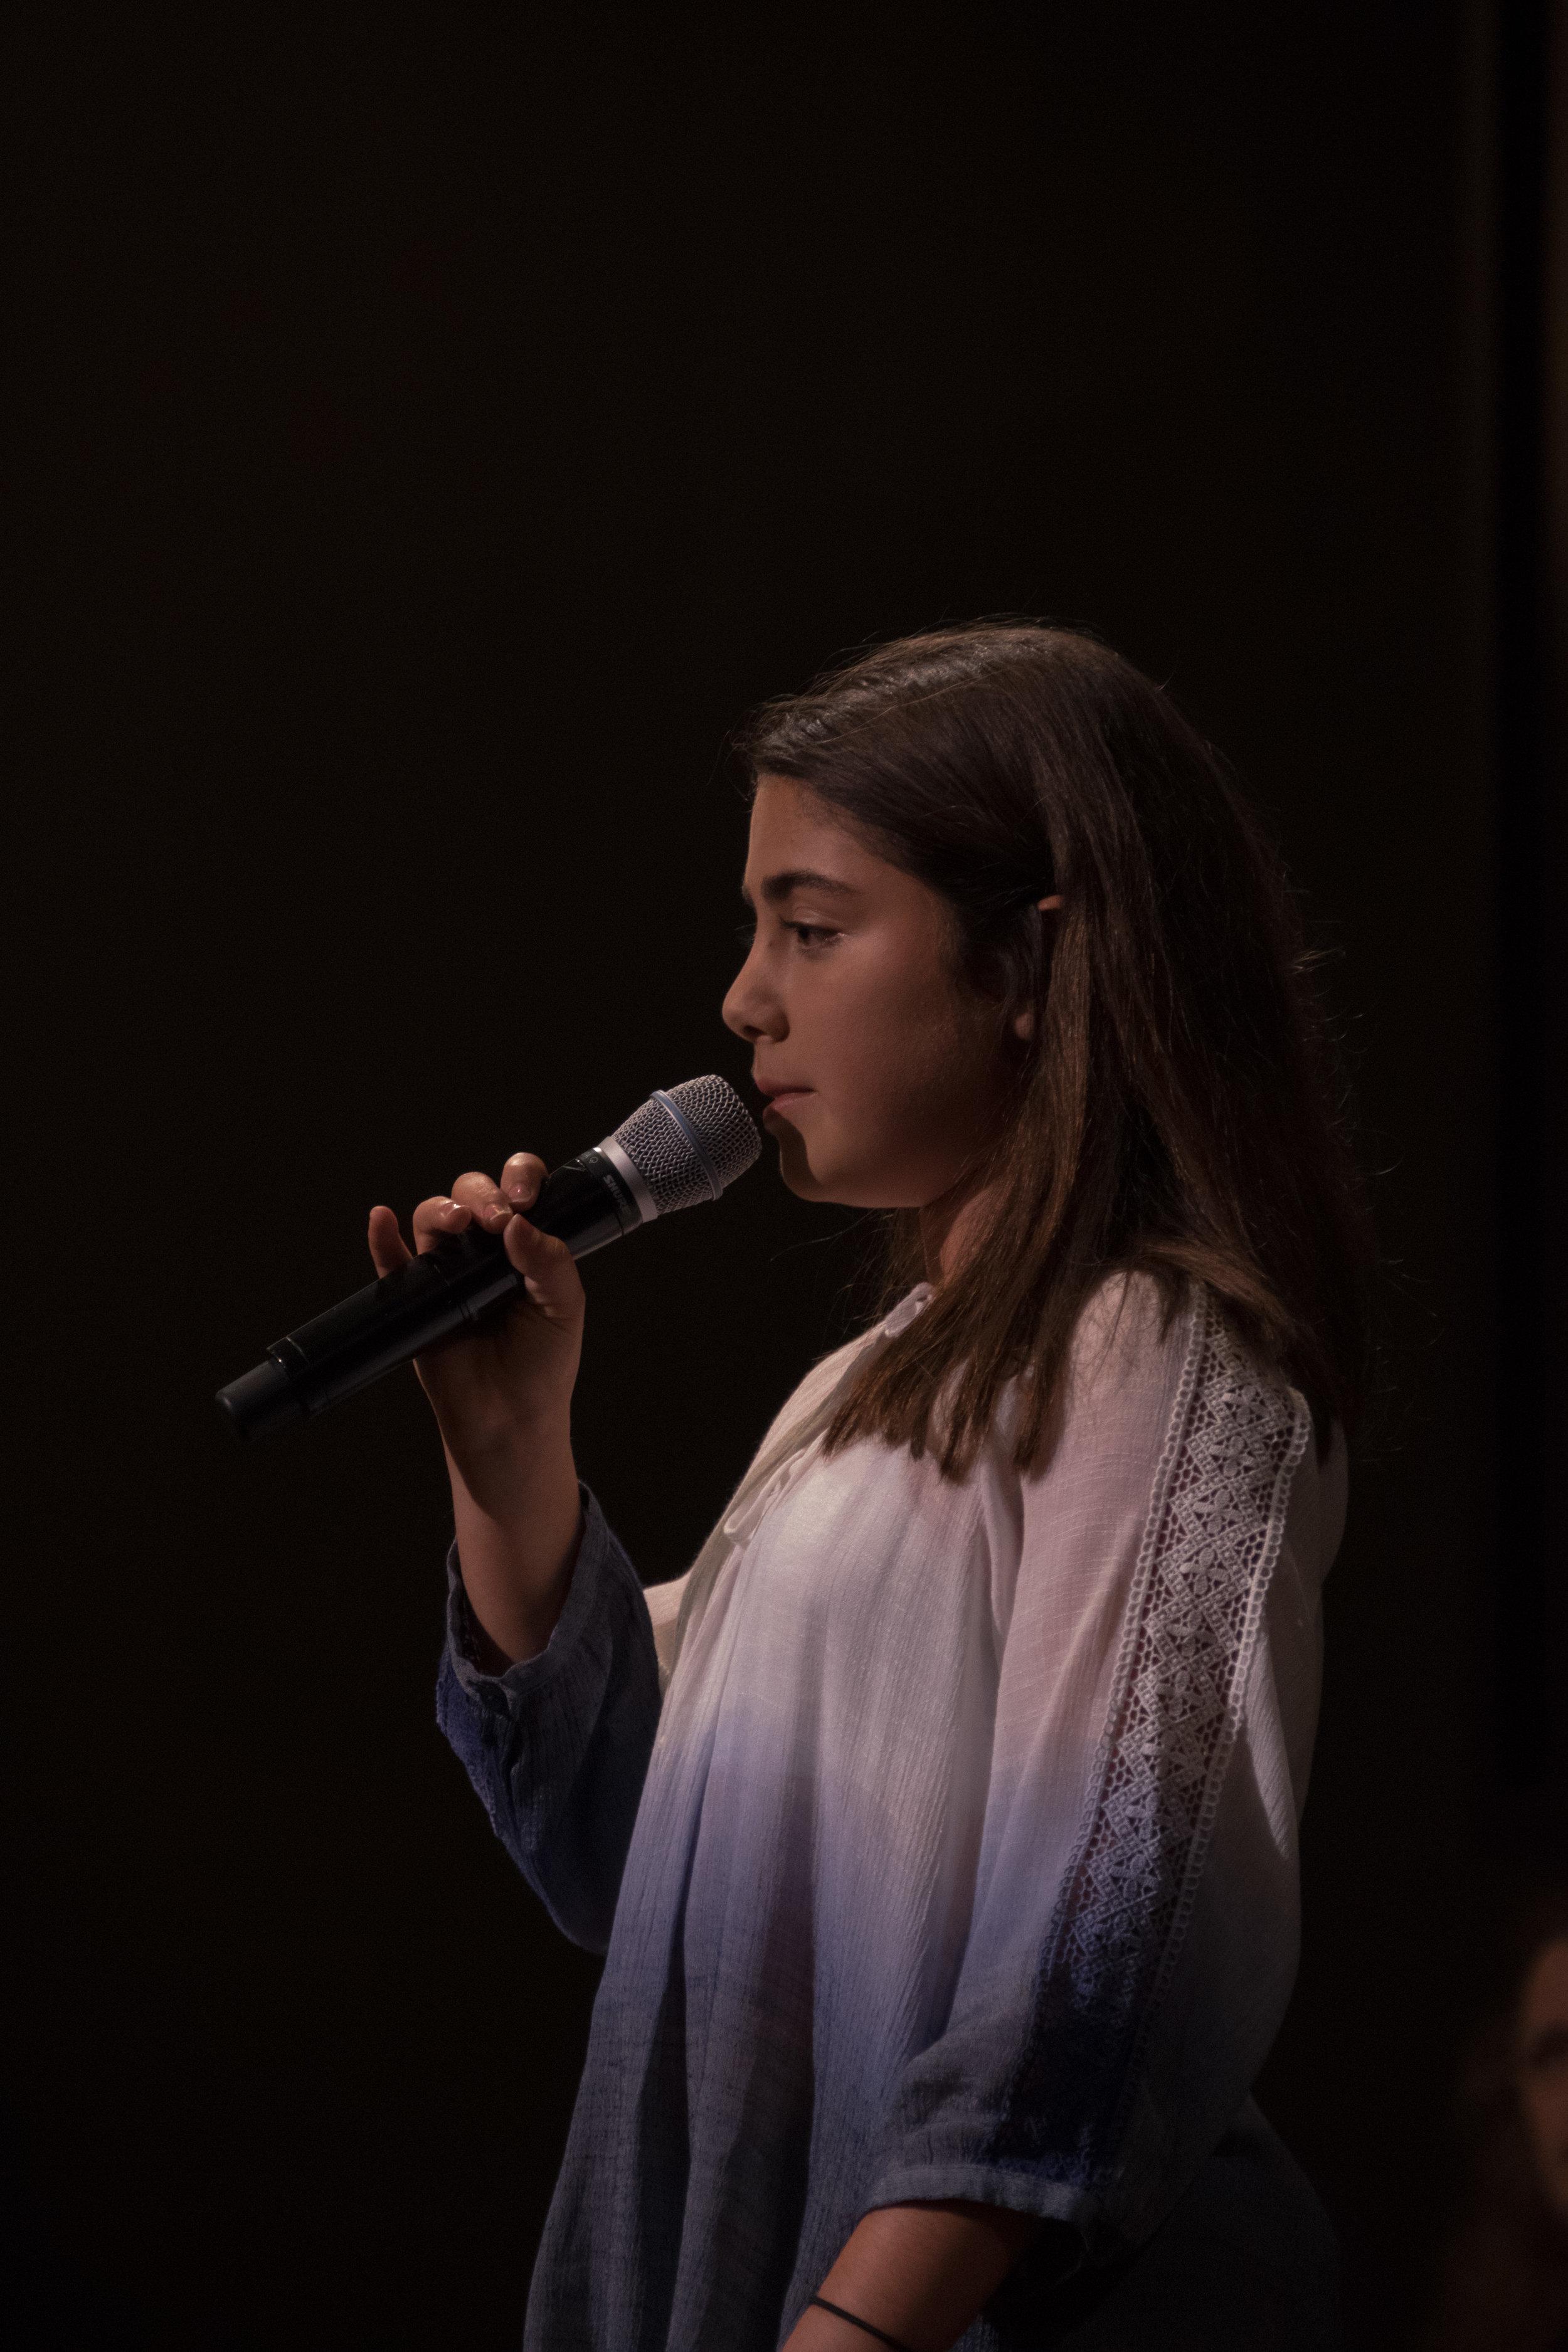 Isabella Balikian